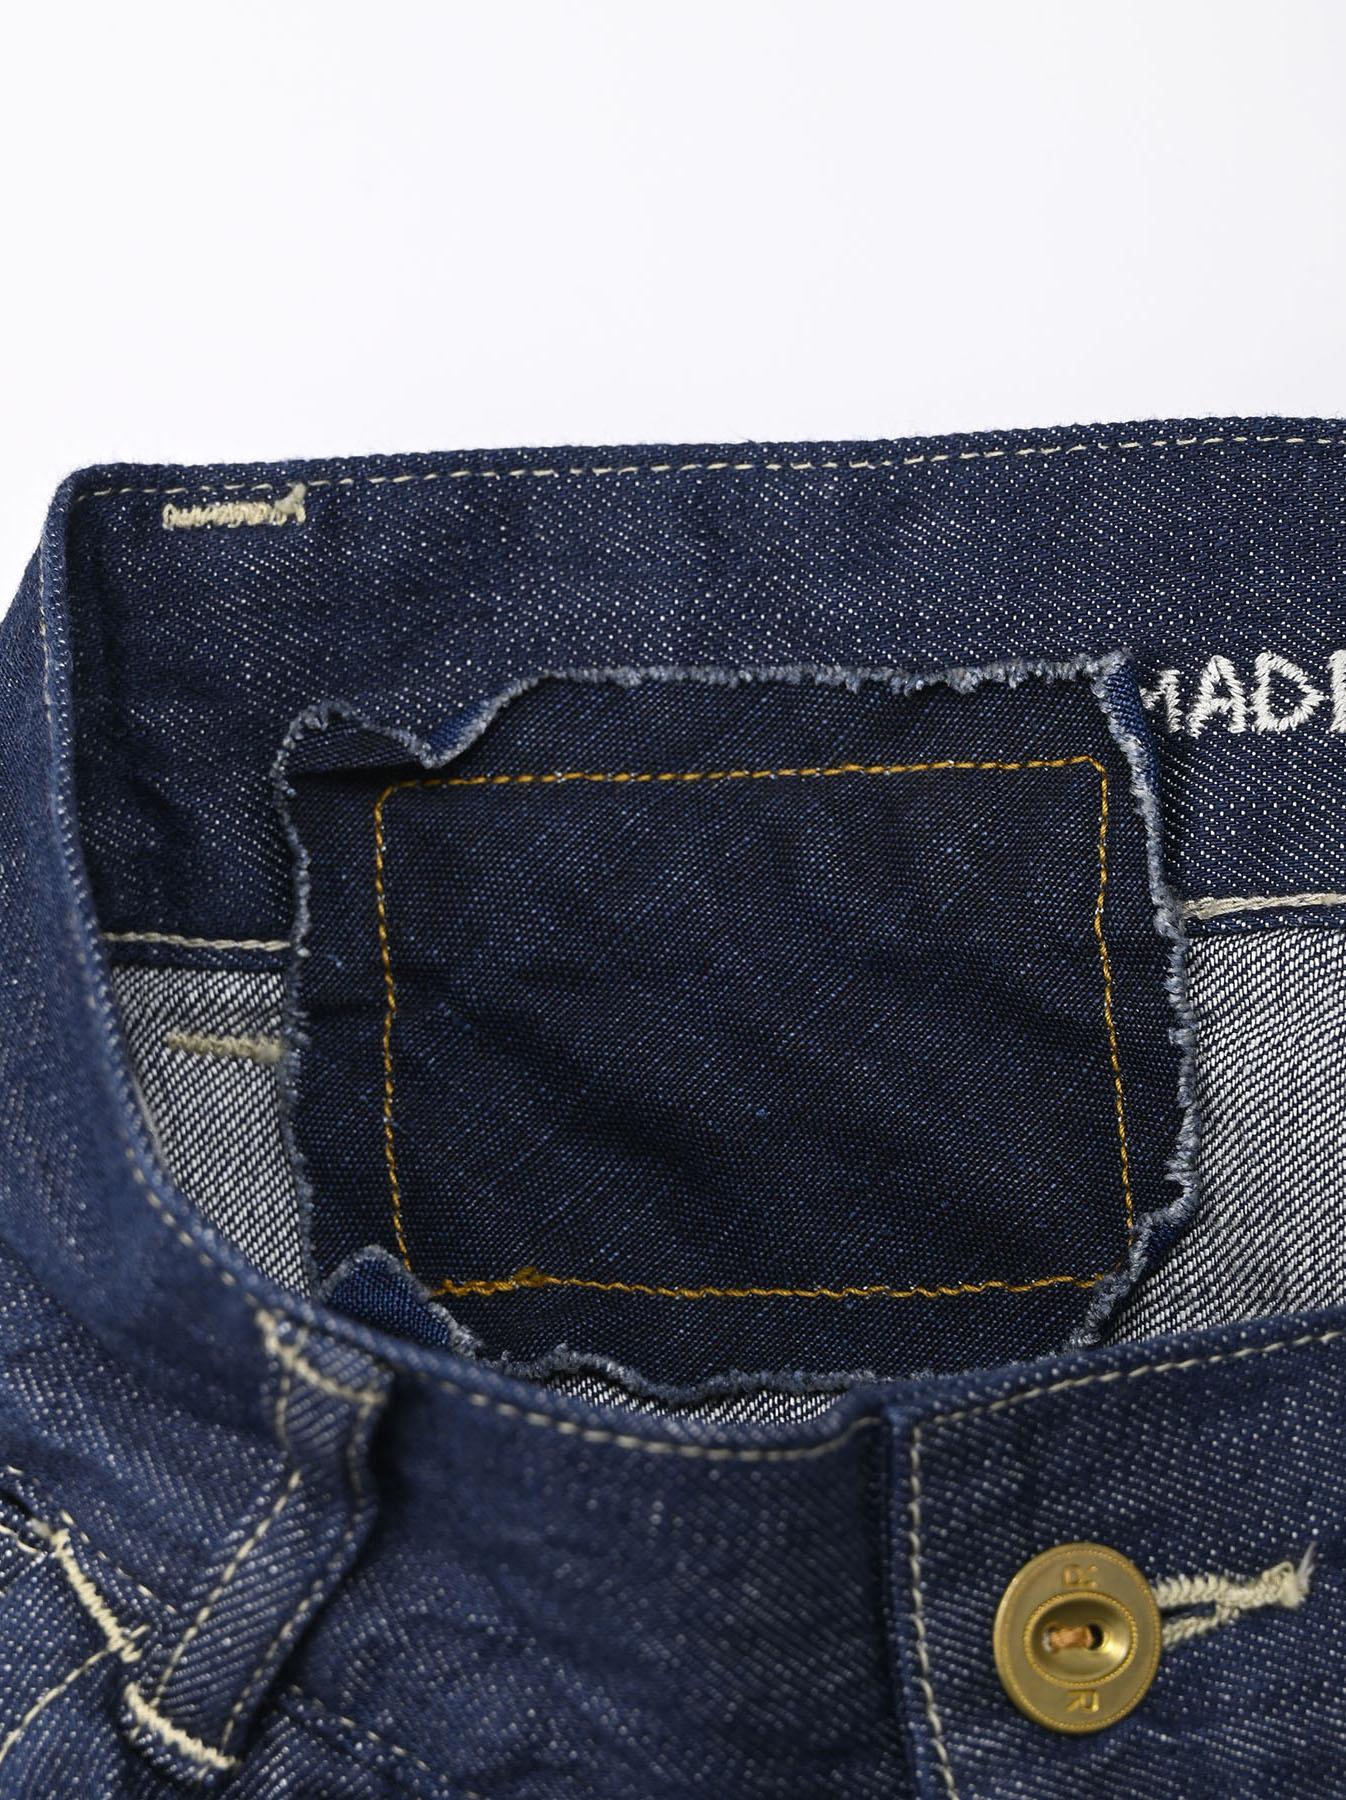 Indigo Nou 908 Painter Pants (0721)-10